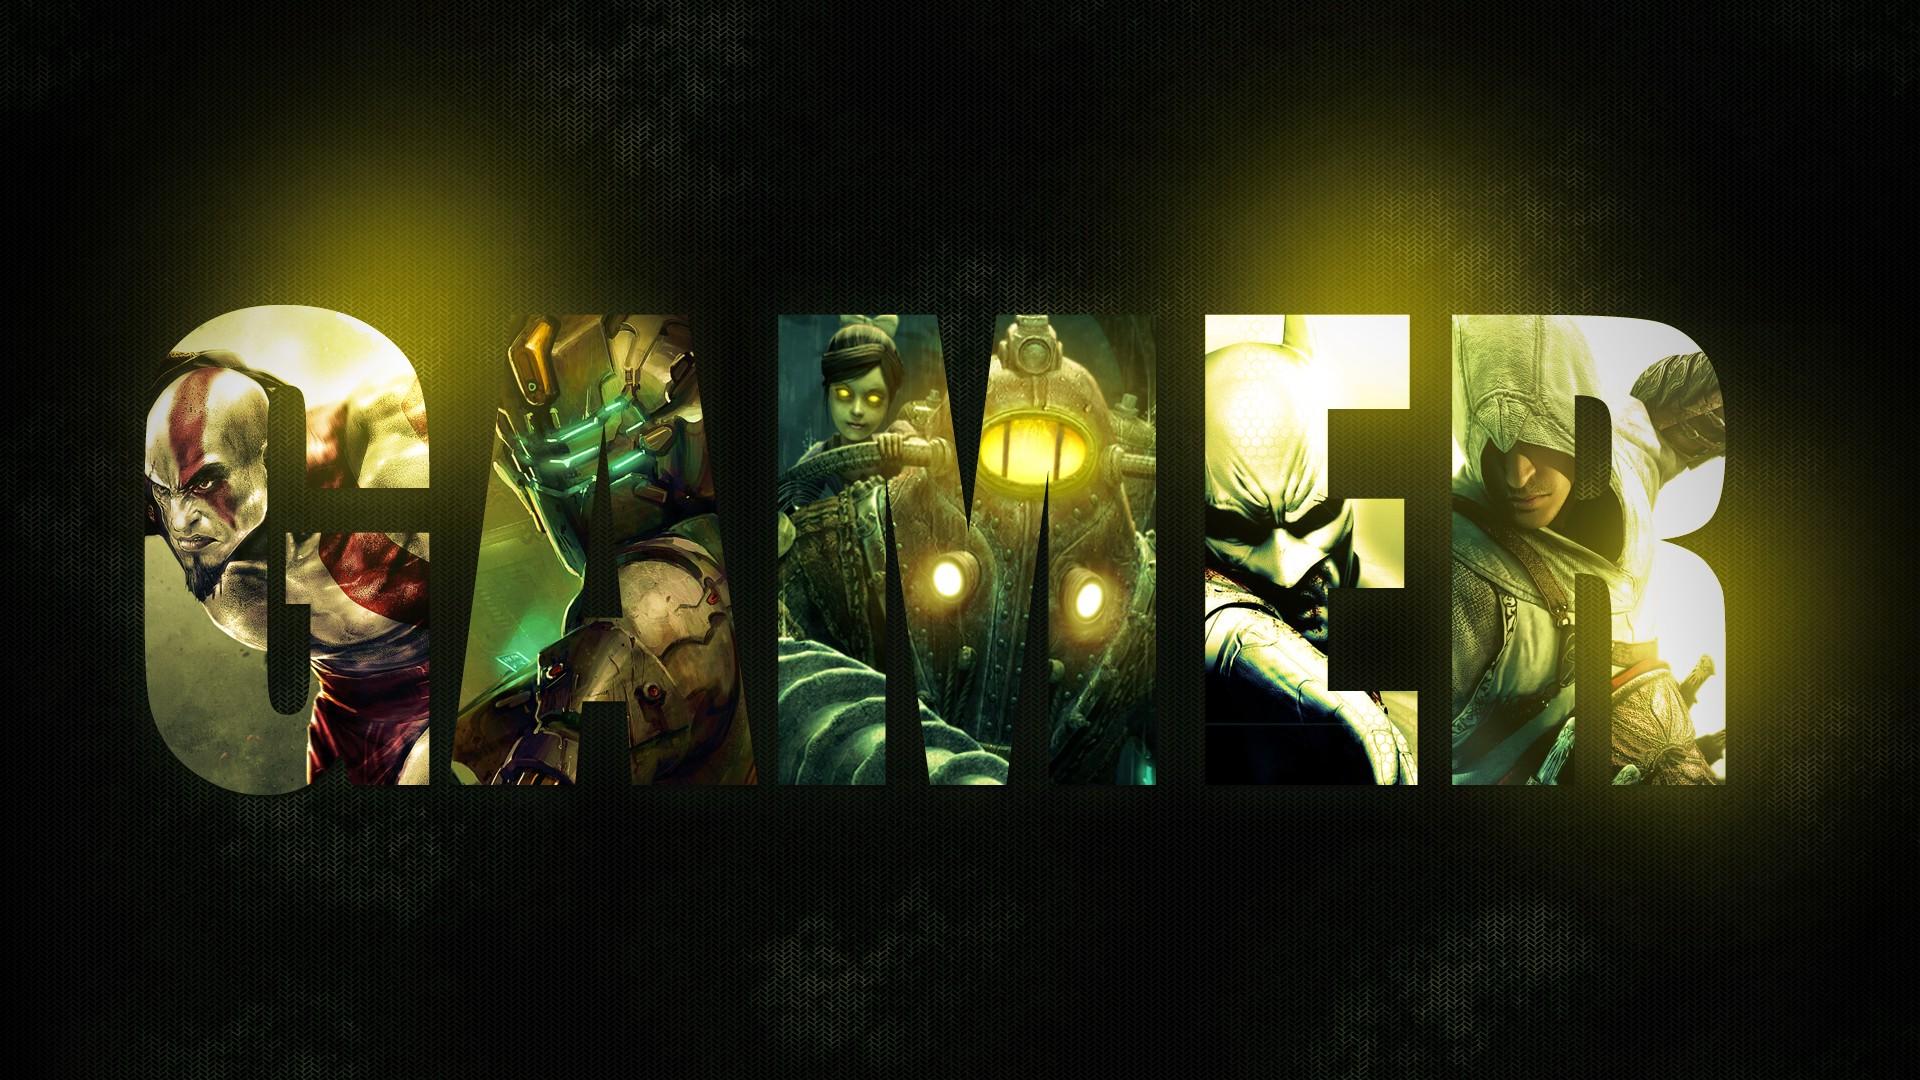 Assassin 039 S Creed Batman Arkham City Bioshock Dead Space Digital Art Gamer Typography 1920x1080